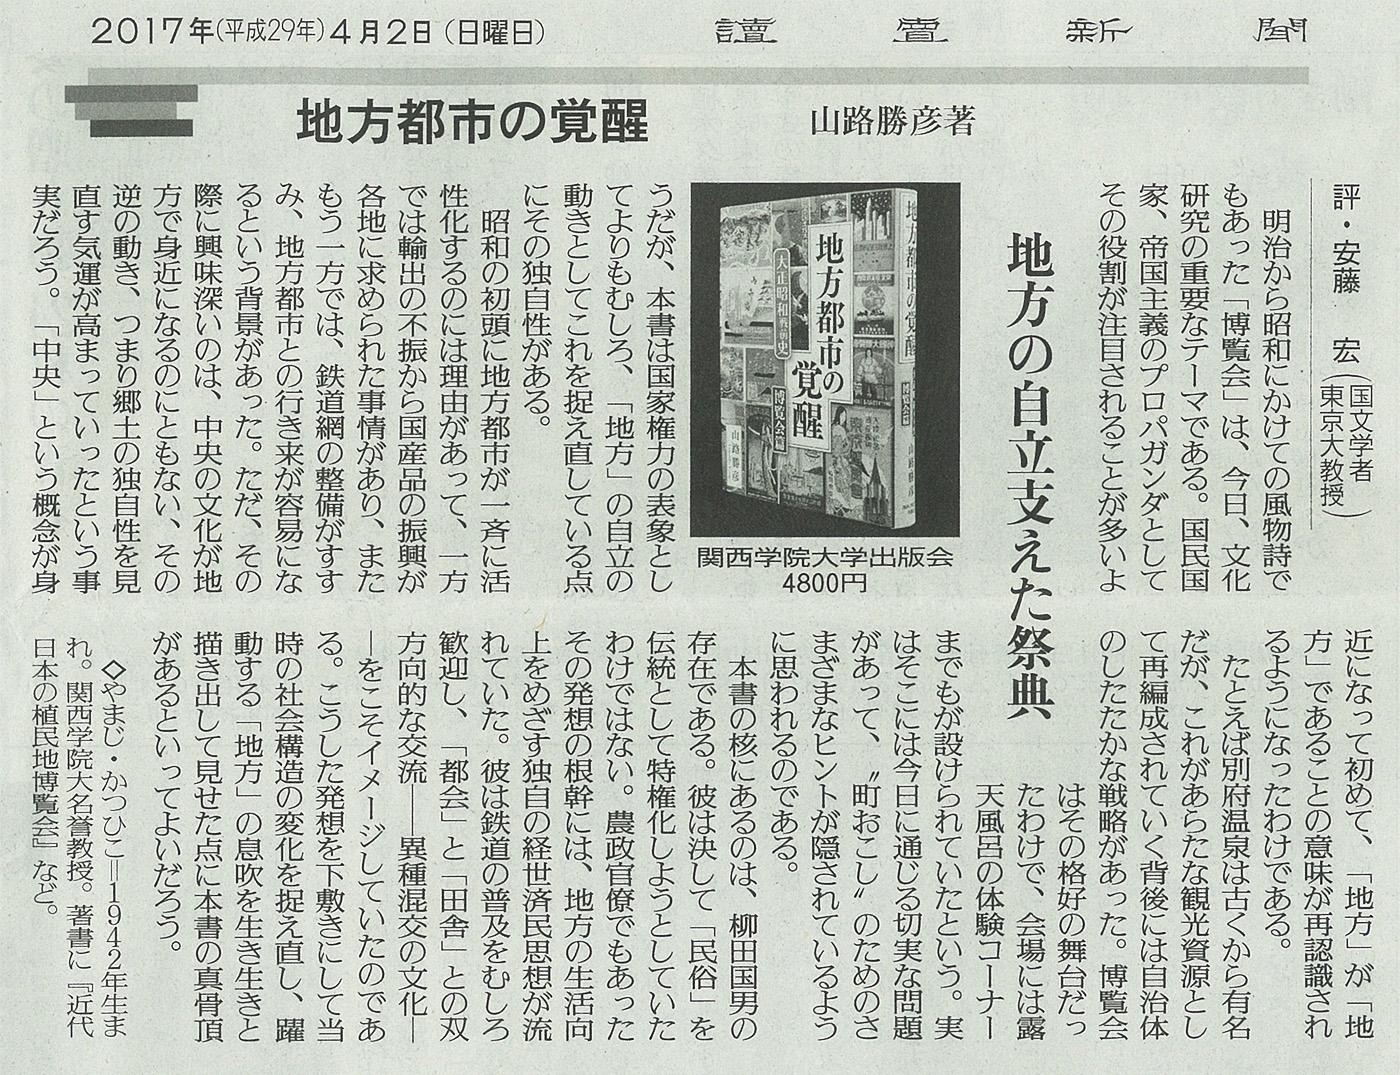 地方都市の覚醒170402読売新聞